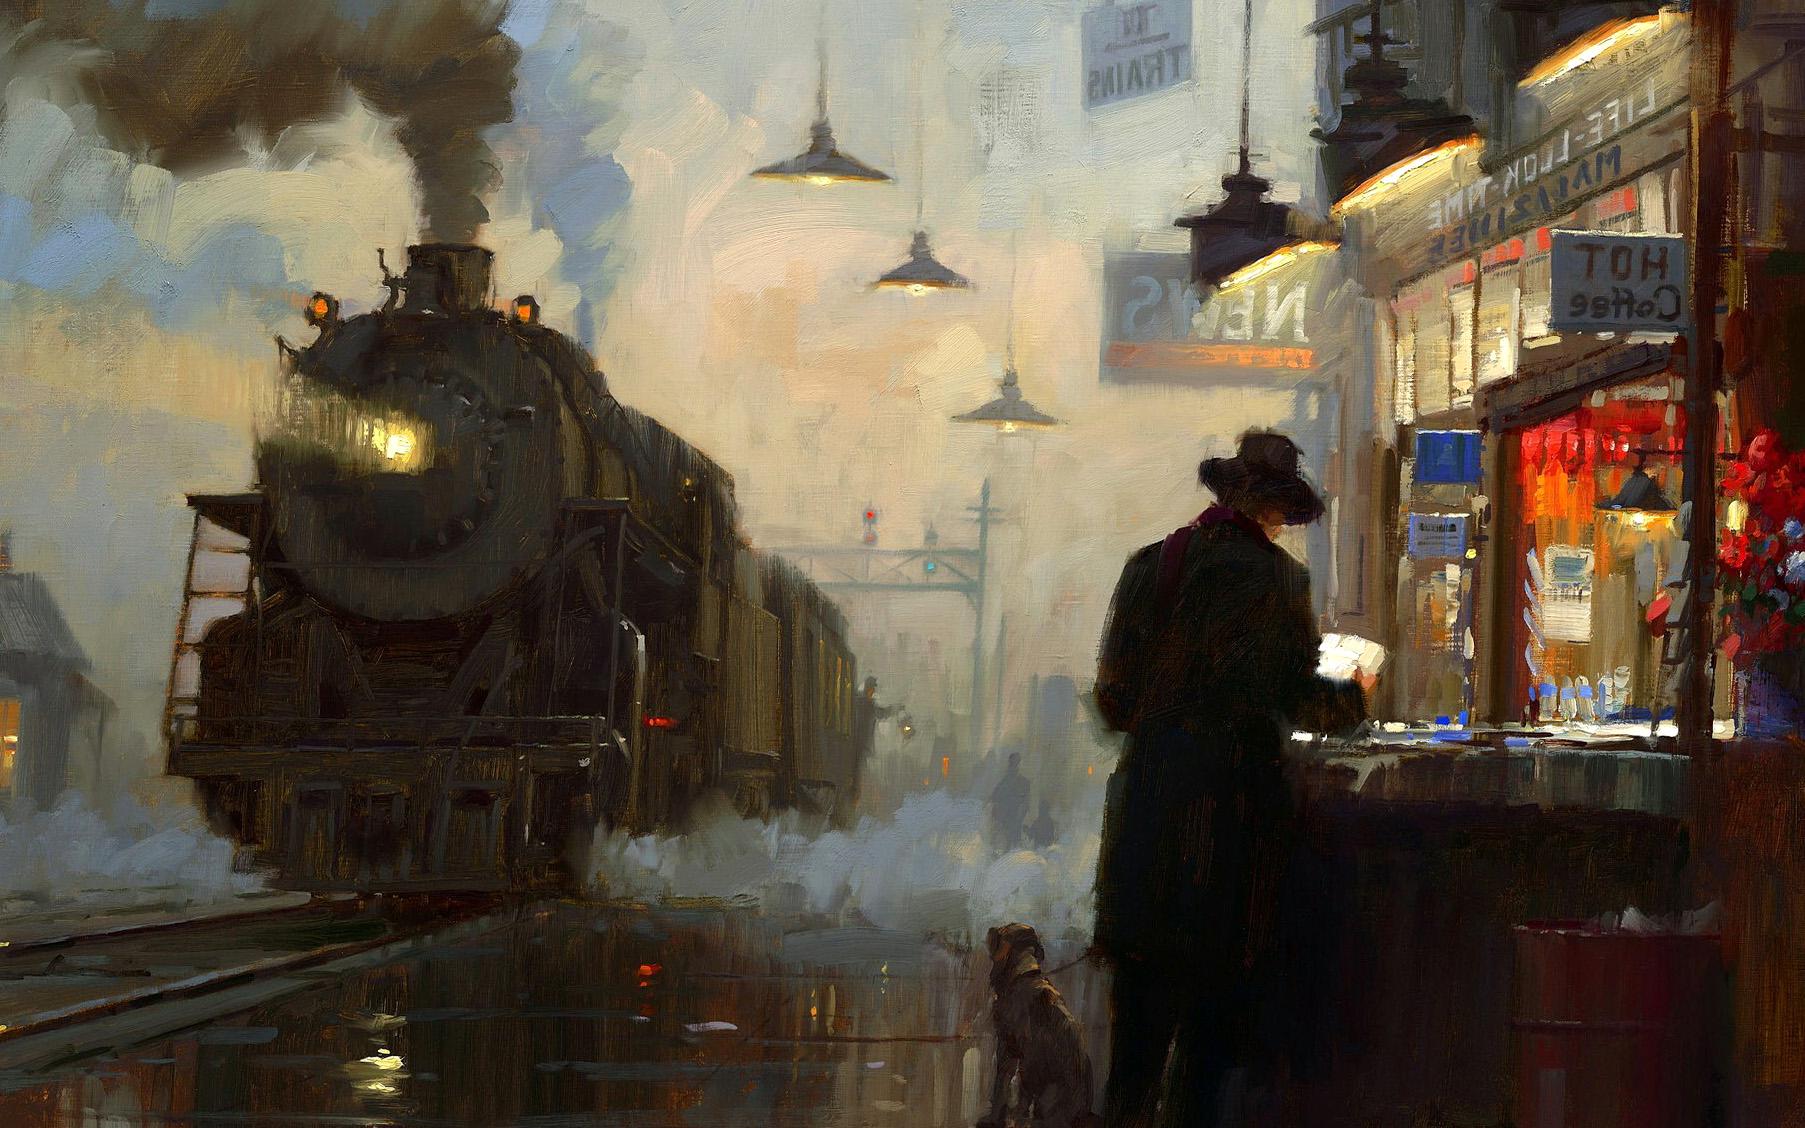 Train, Station, Painting, Digital, Art, Wallpaper, High Resolution ...